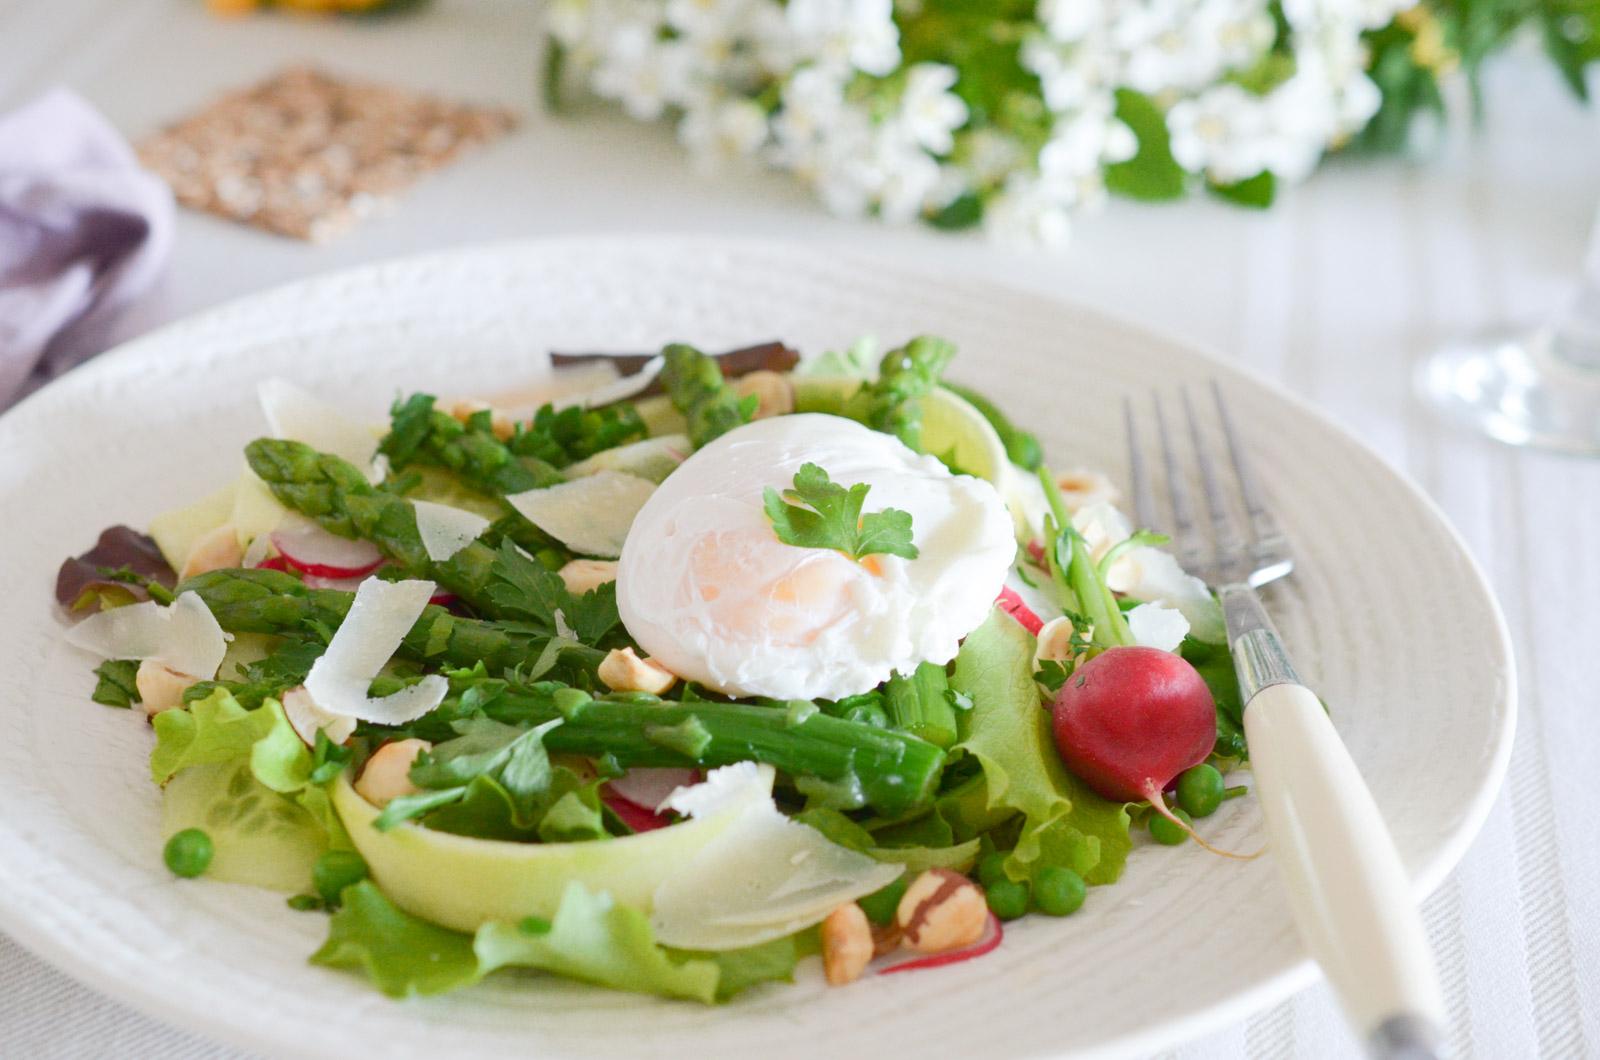 Salade Asperges Oeuf Poche (6 Sur 8)